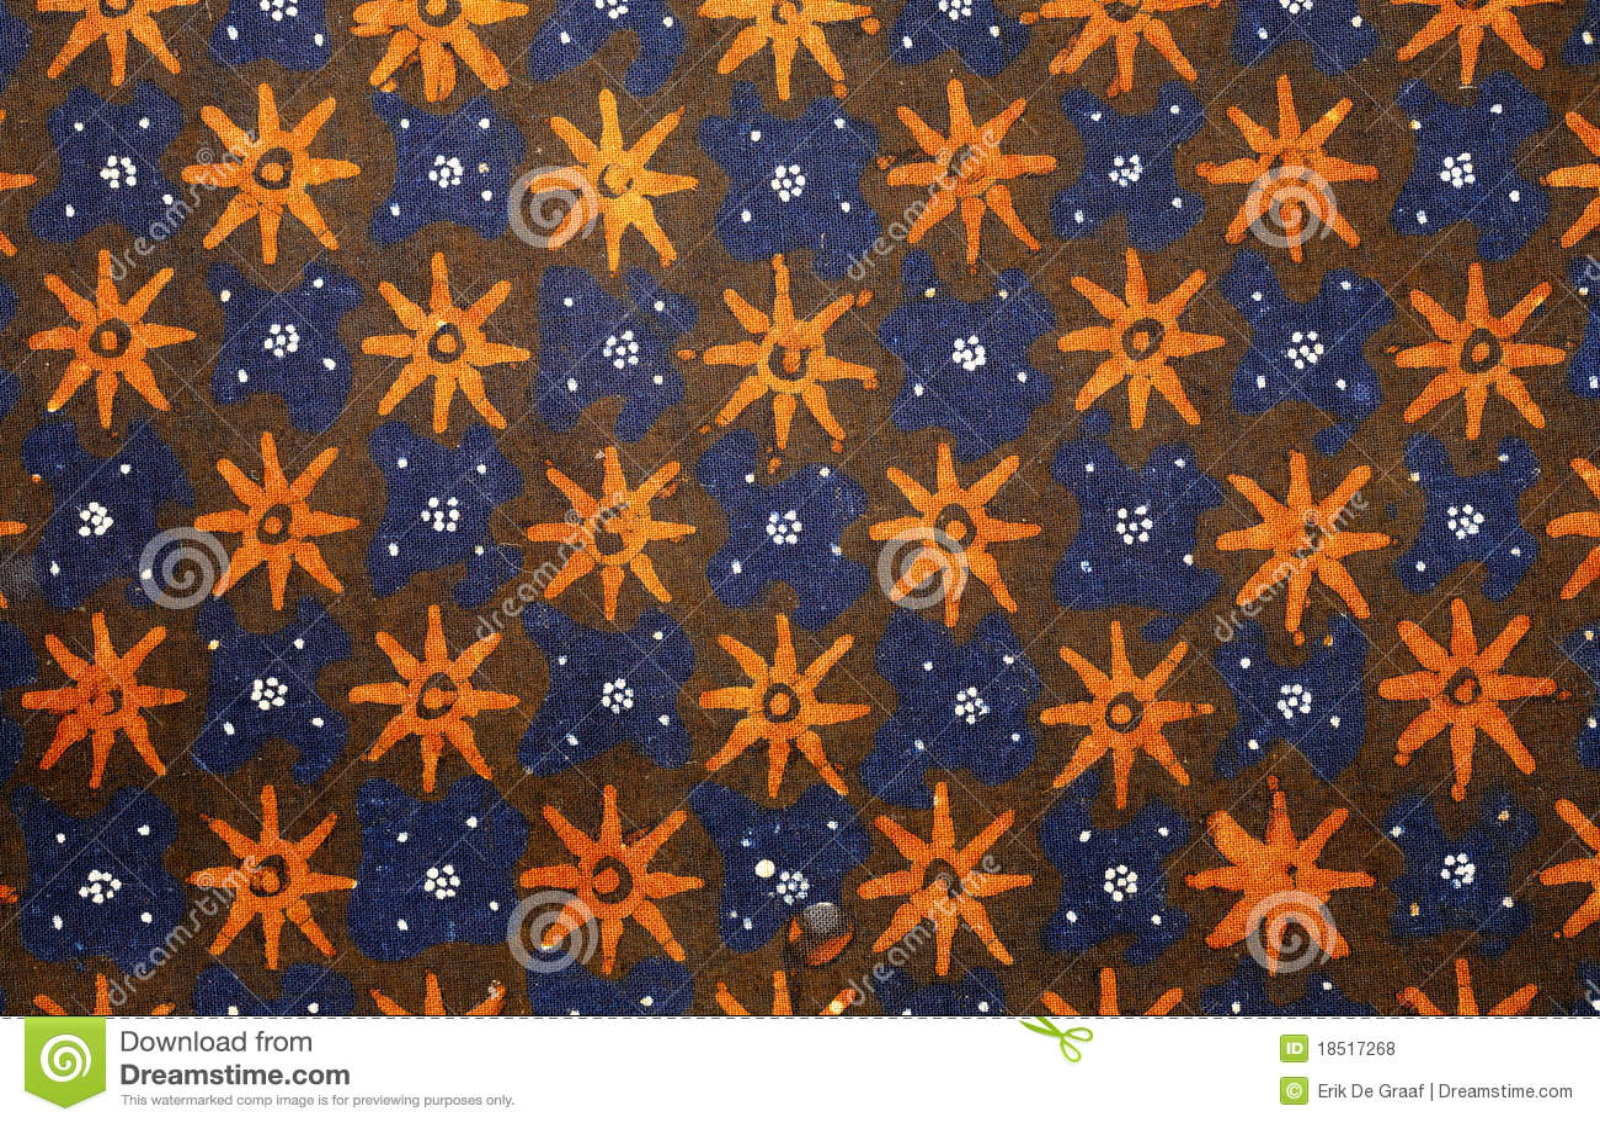 Batik design royalty free stock photos image 29546988 - Batik Design Royalty Free Stock Photos Image 18517268 Wallpaper